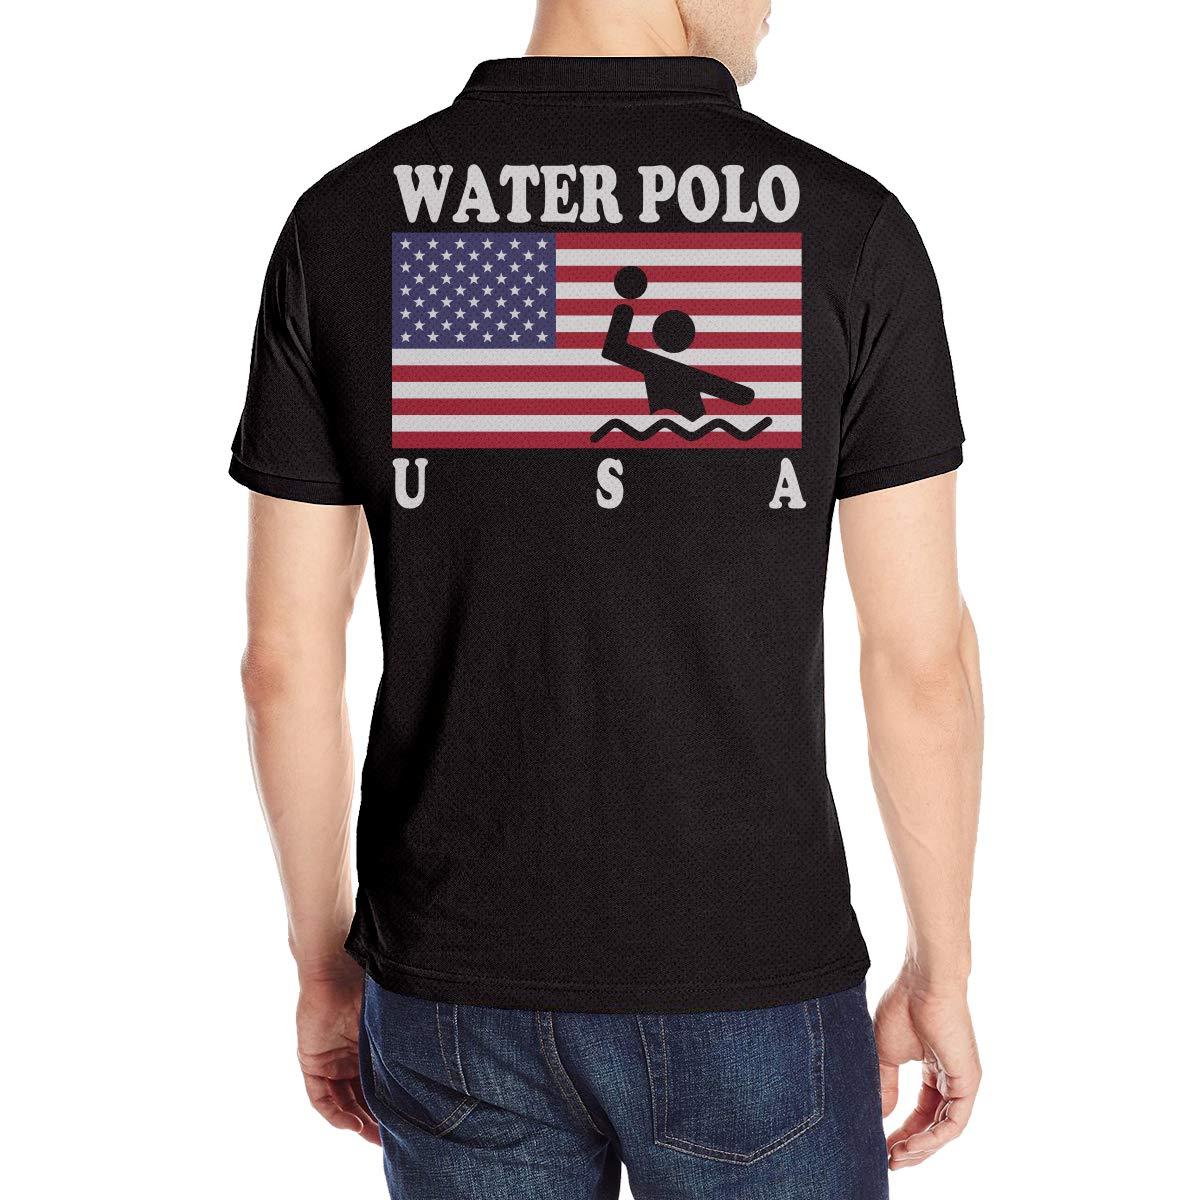 KH5GJ-25 Mens American Flag Water Polo Short Sleeves Polo T Shirt